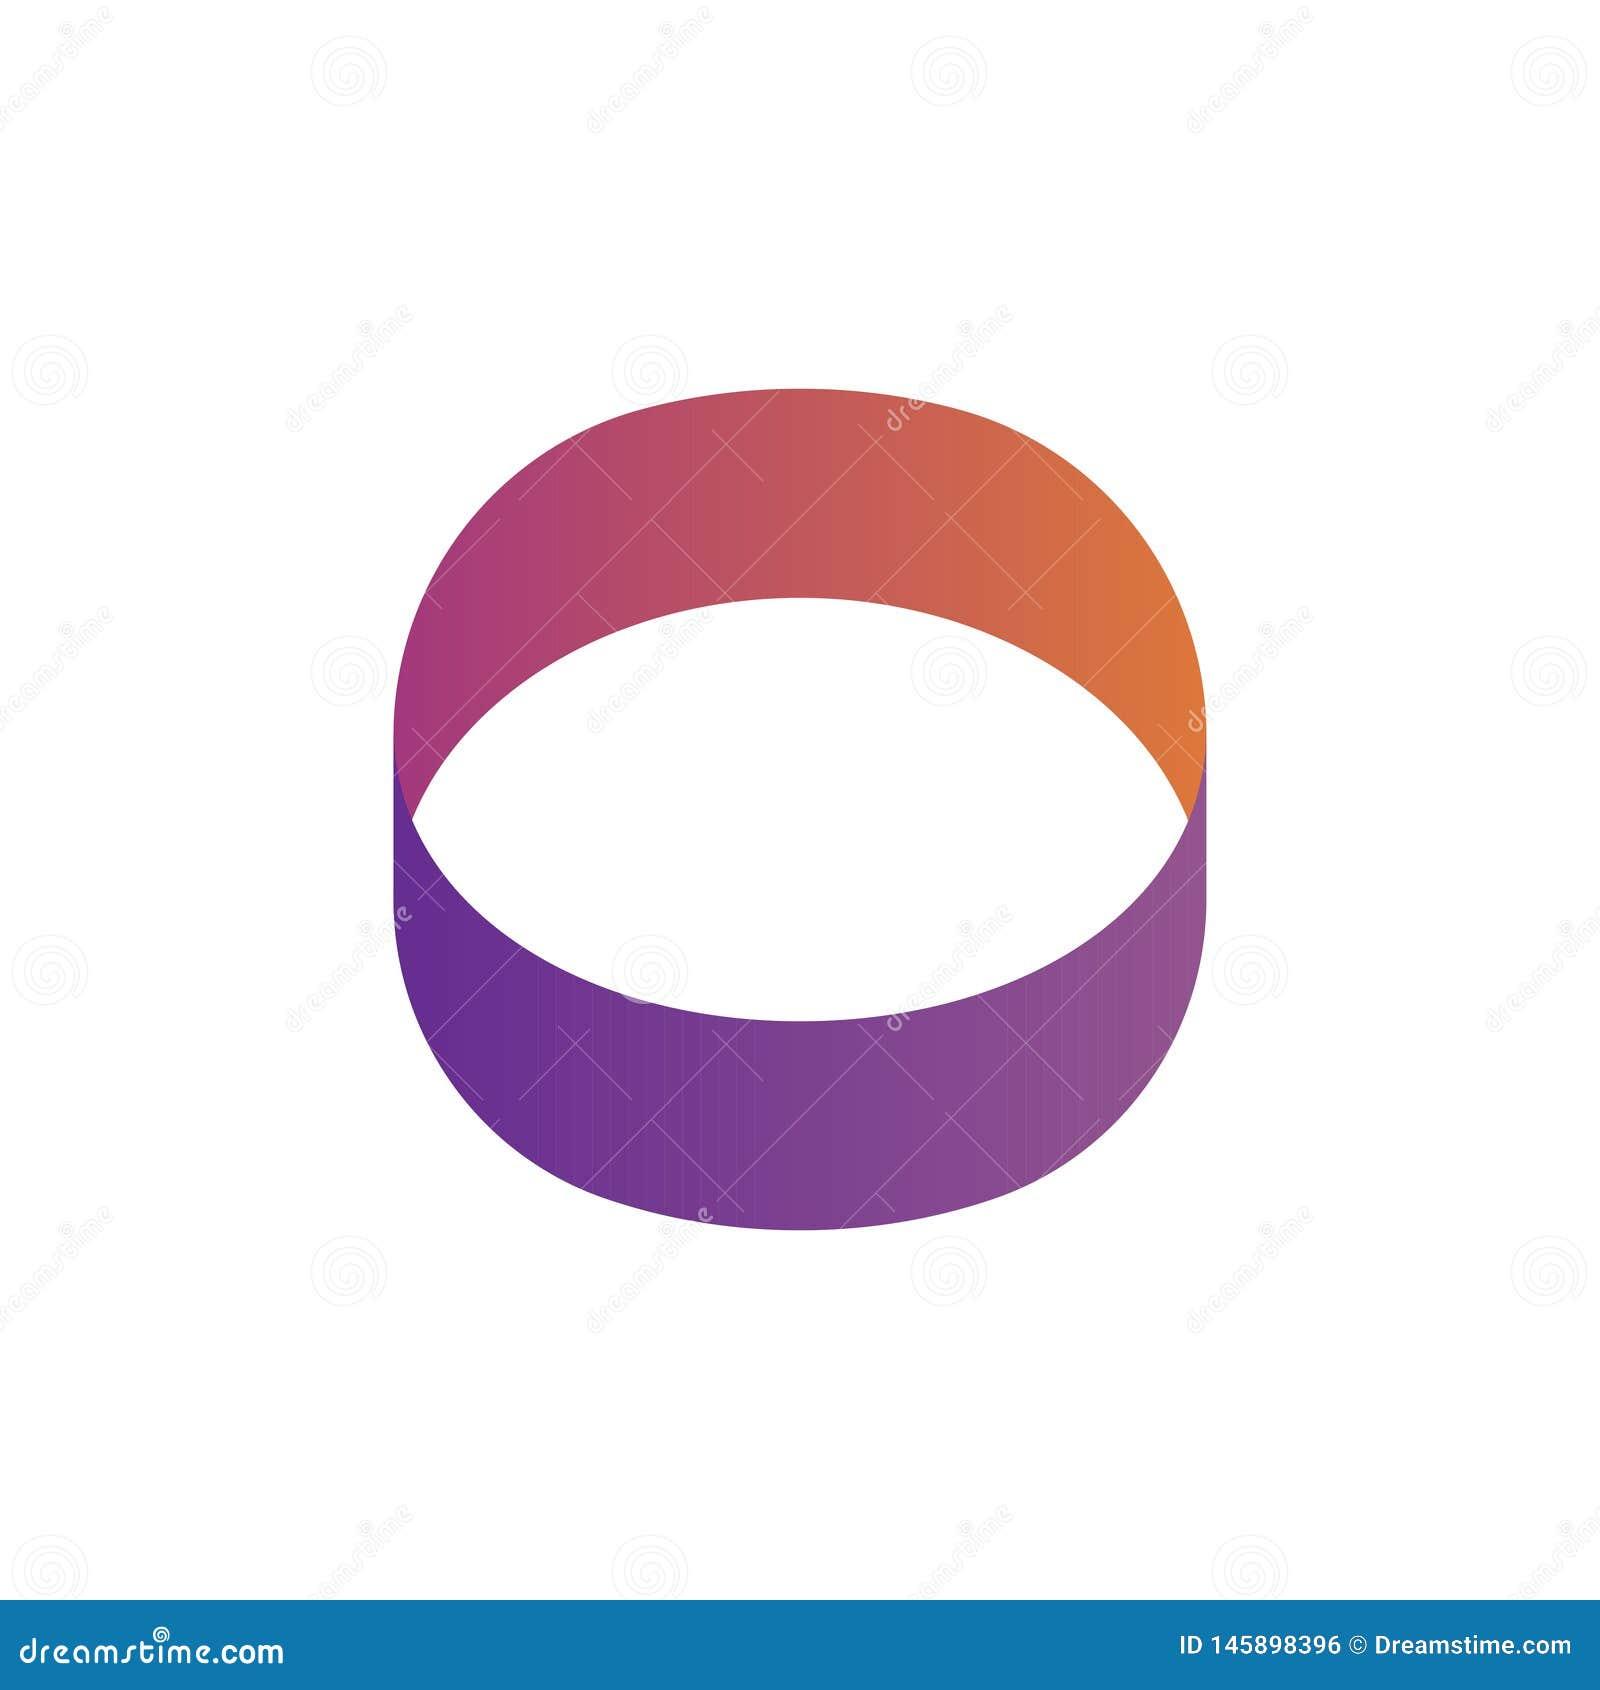 Logotipo do círculo ou logotipo dado forma olho